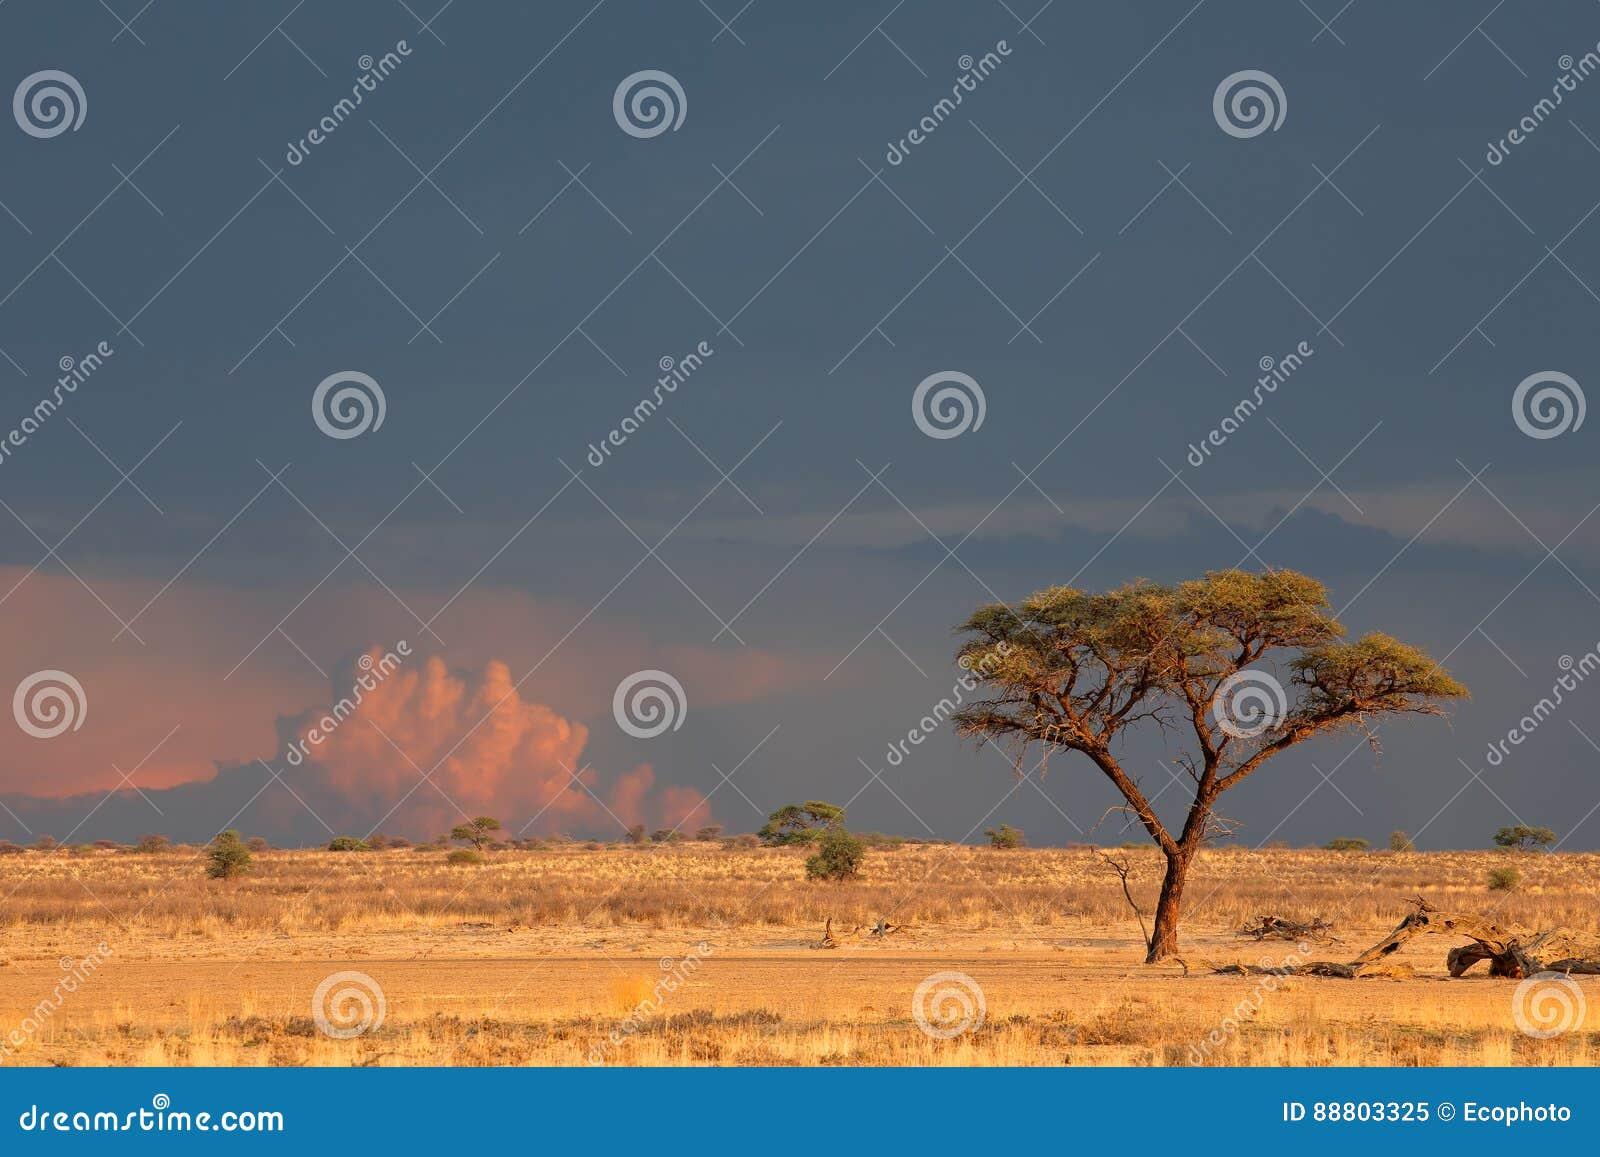 Kalahari desert landscape